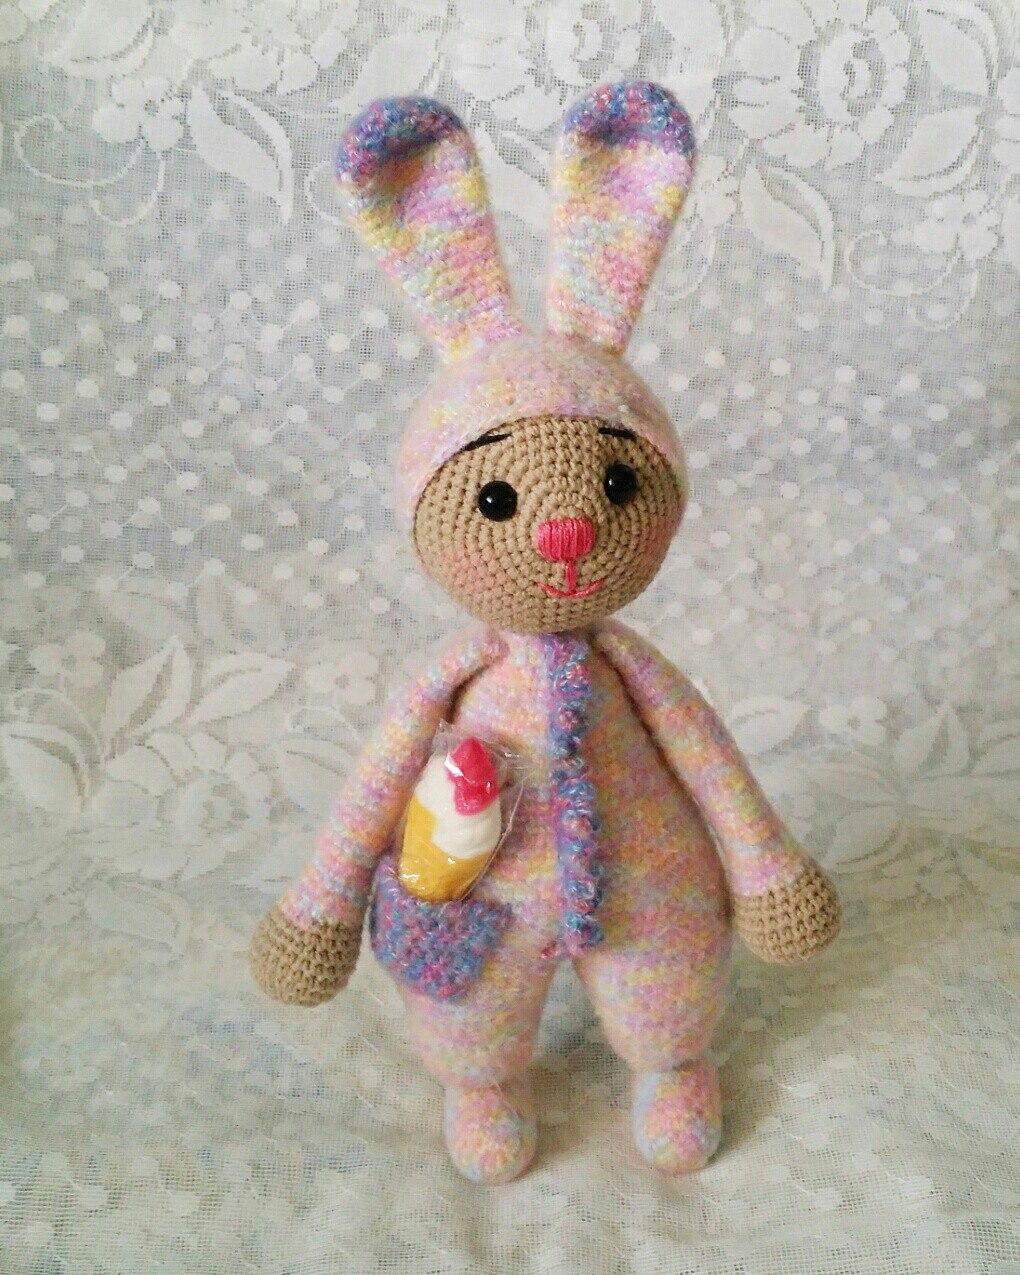 мастер класс по амигуруми заяц в пижаме крючком